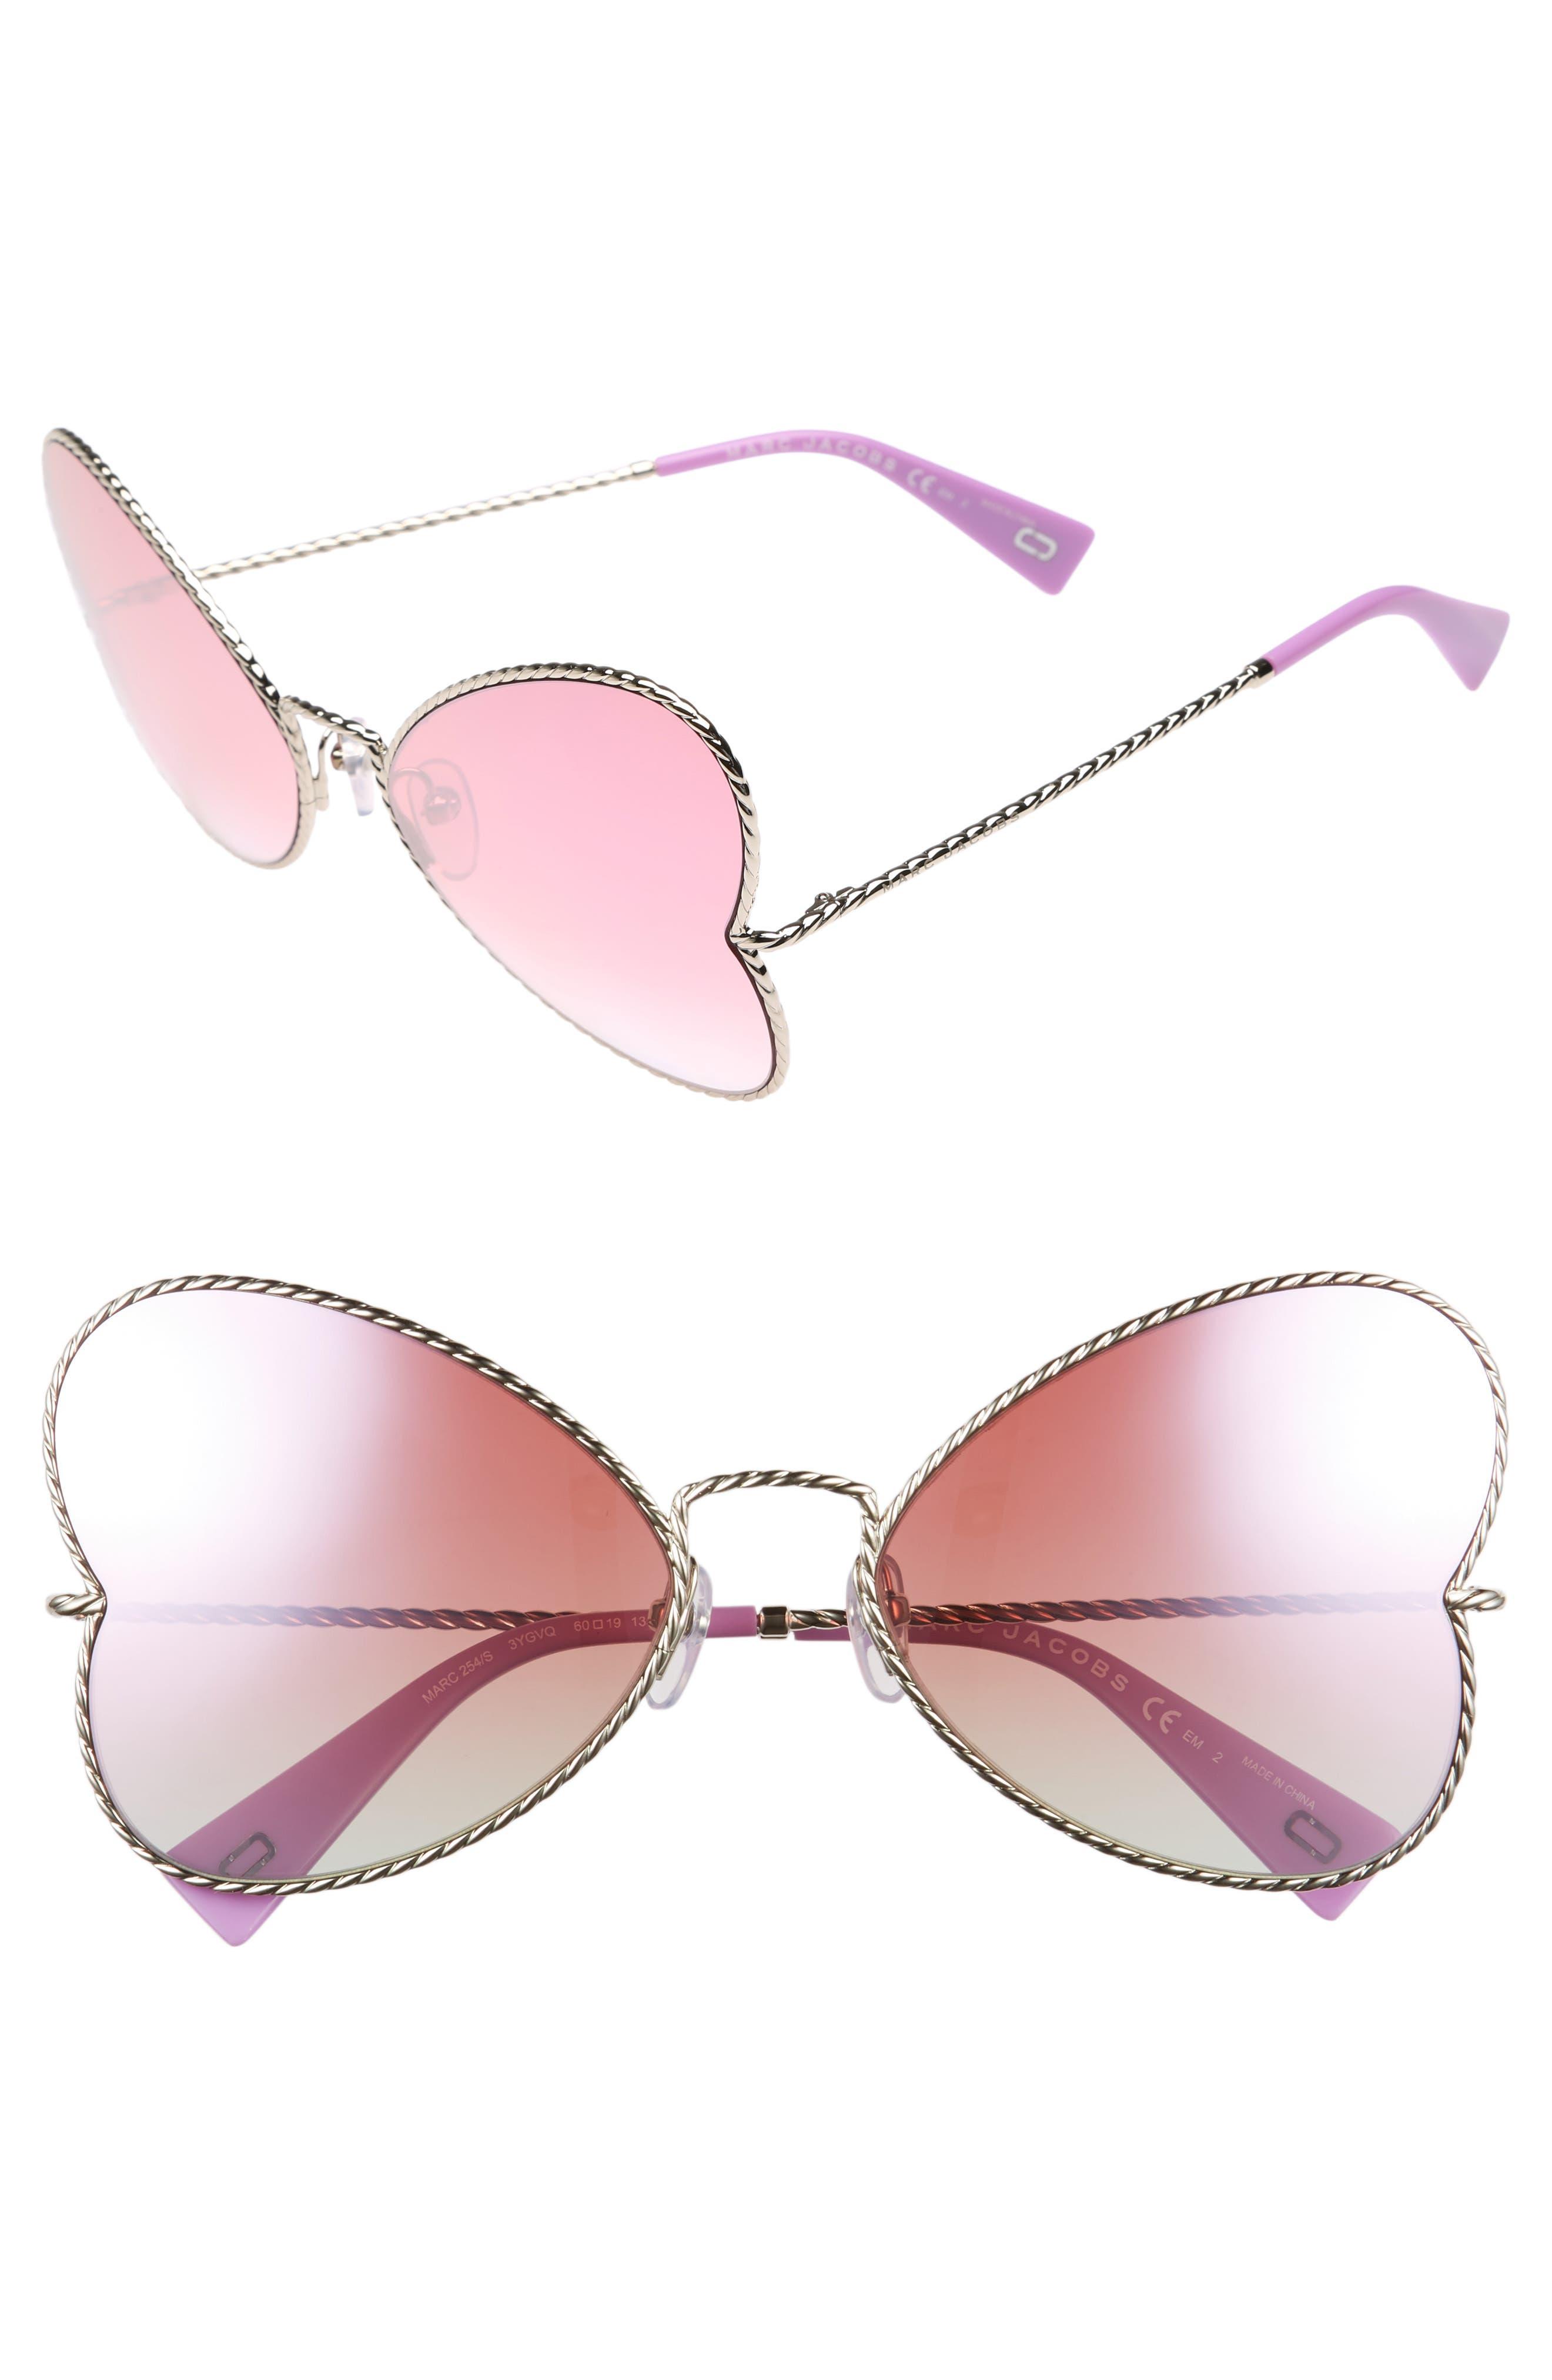 60mm Heart Sunglasses,                         Main,                         color, Gold